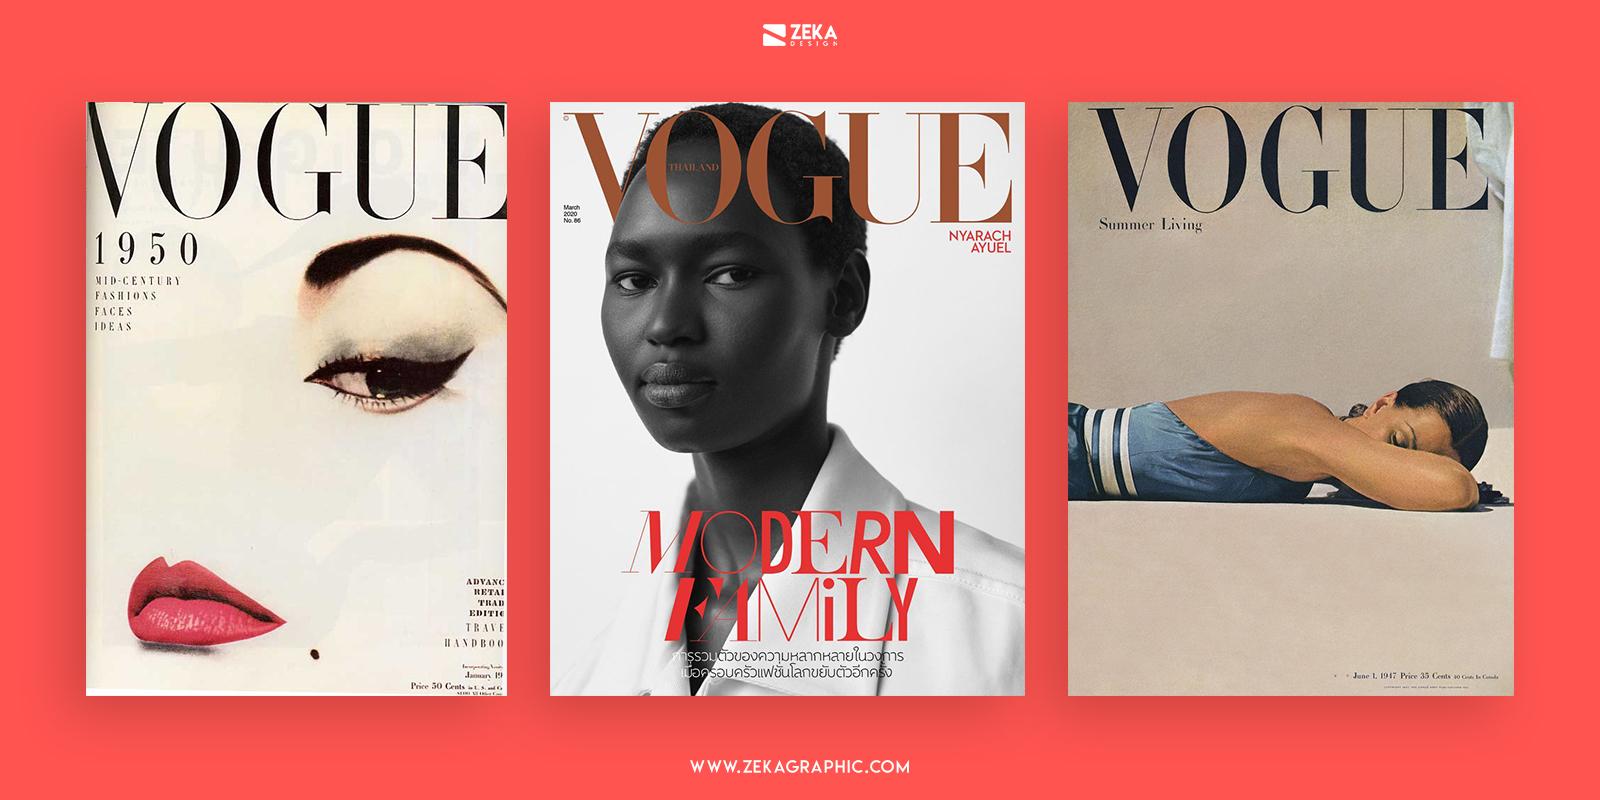 Vogue Fashion Cover Bodoni Typeface